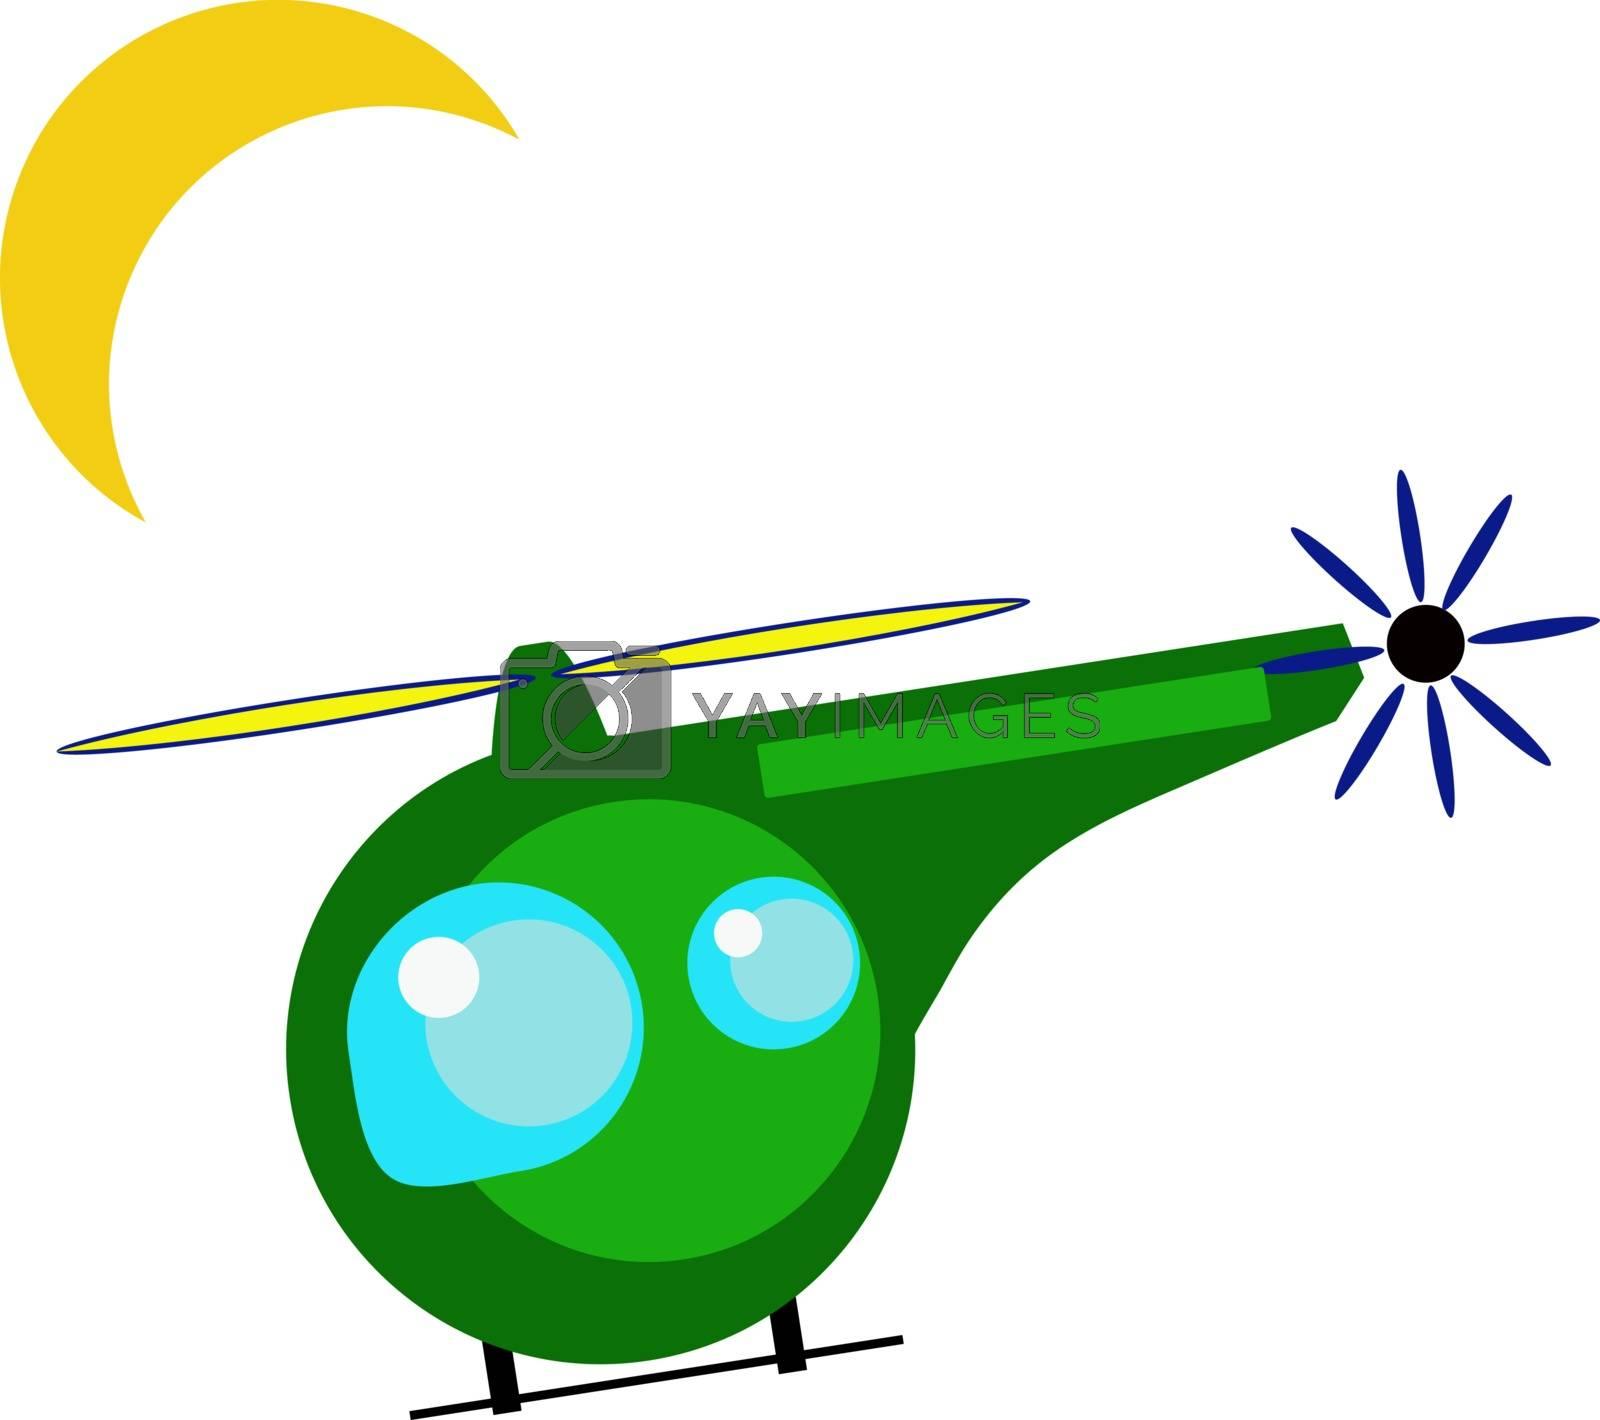 Helicopter flying, illustration, vector on white background.